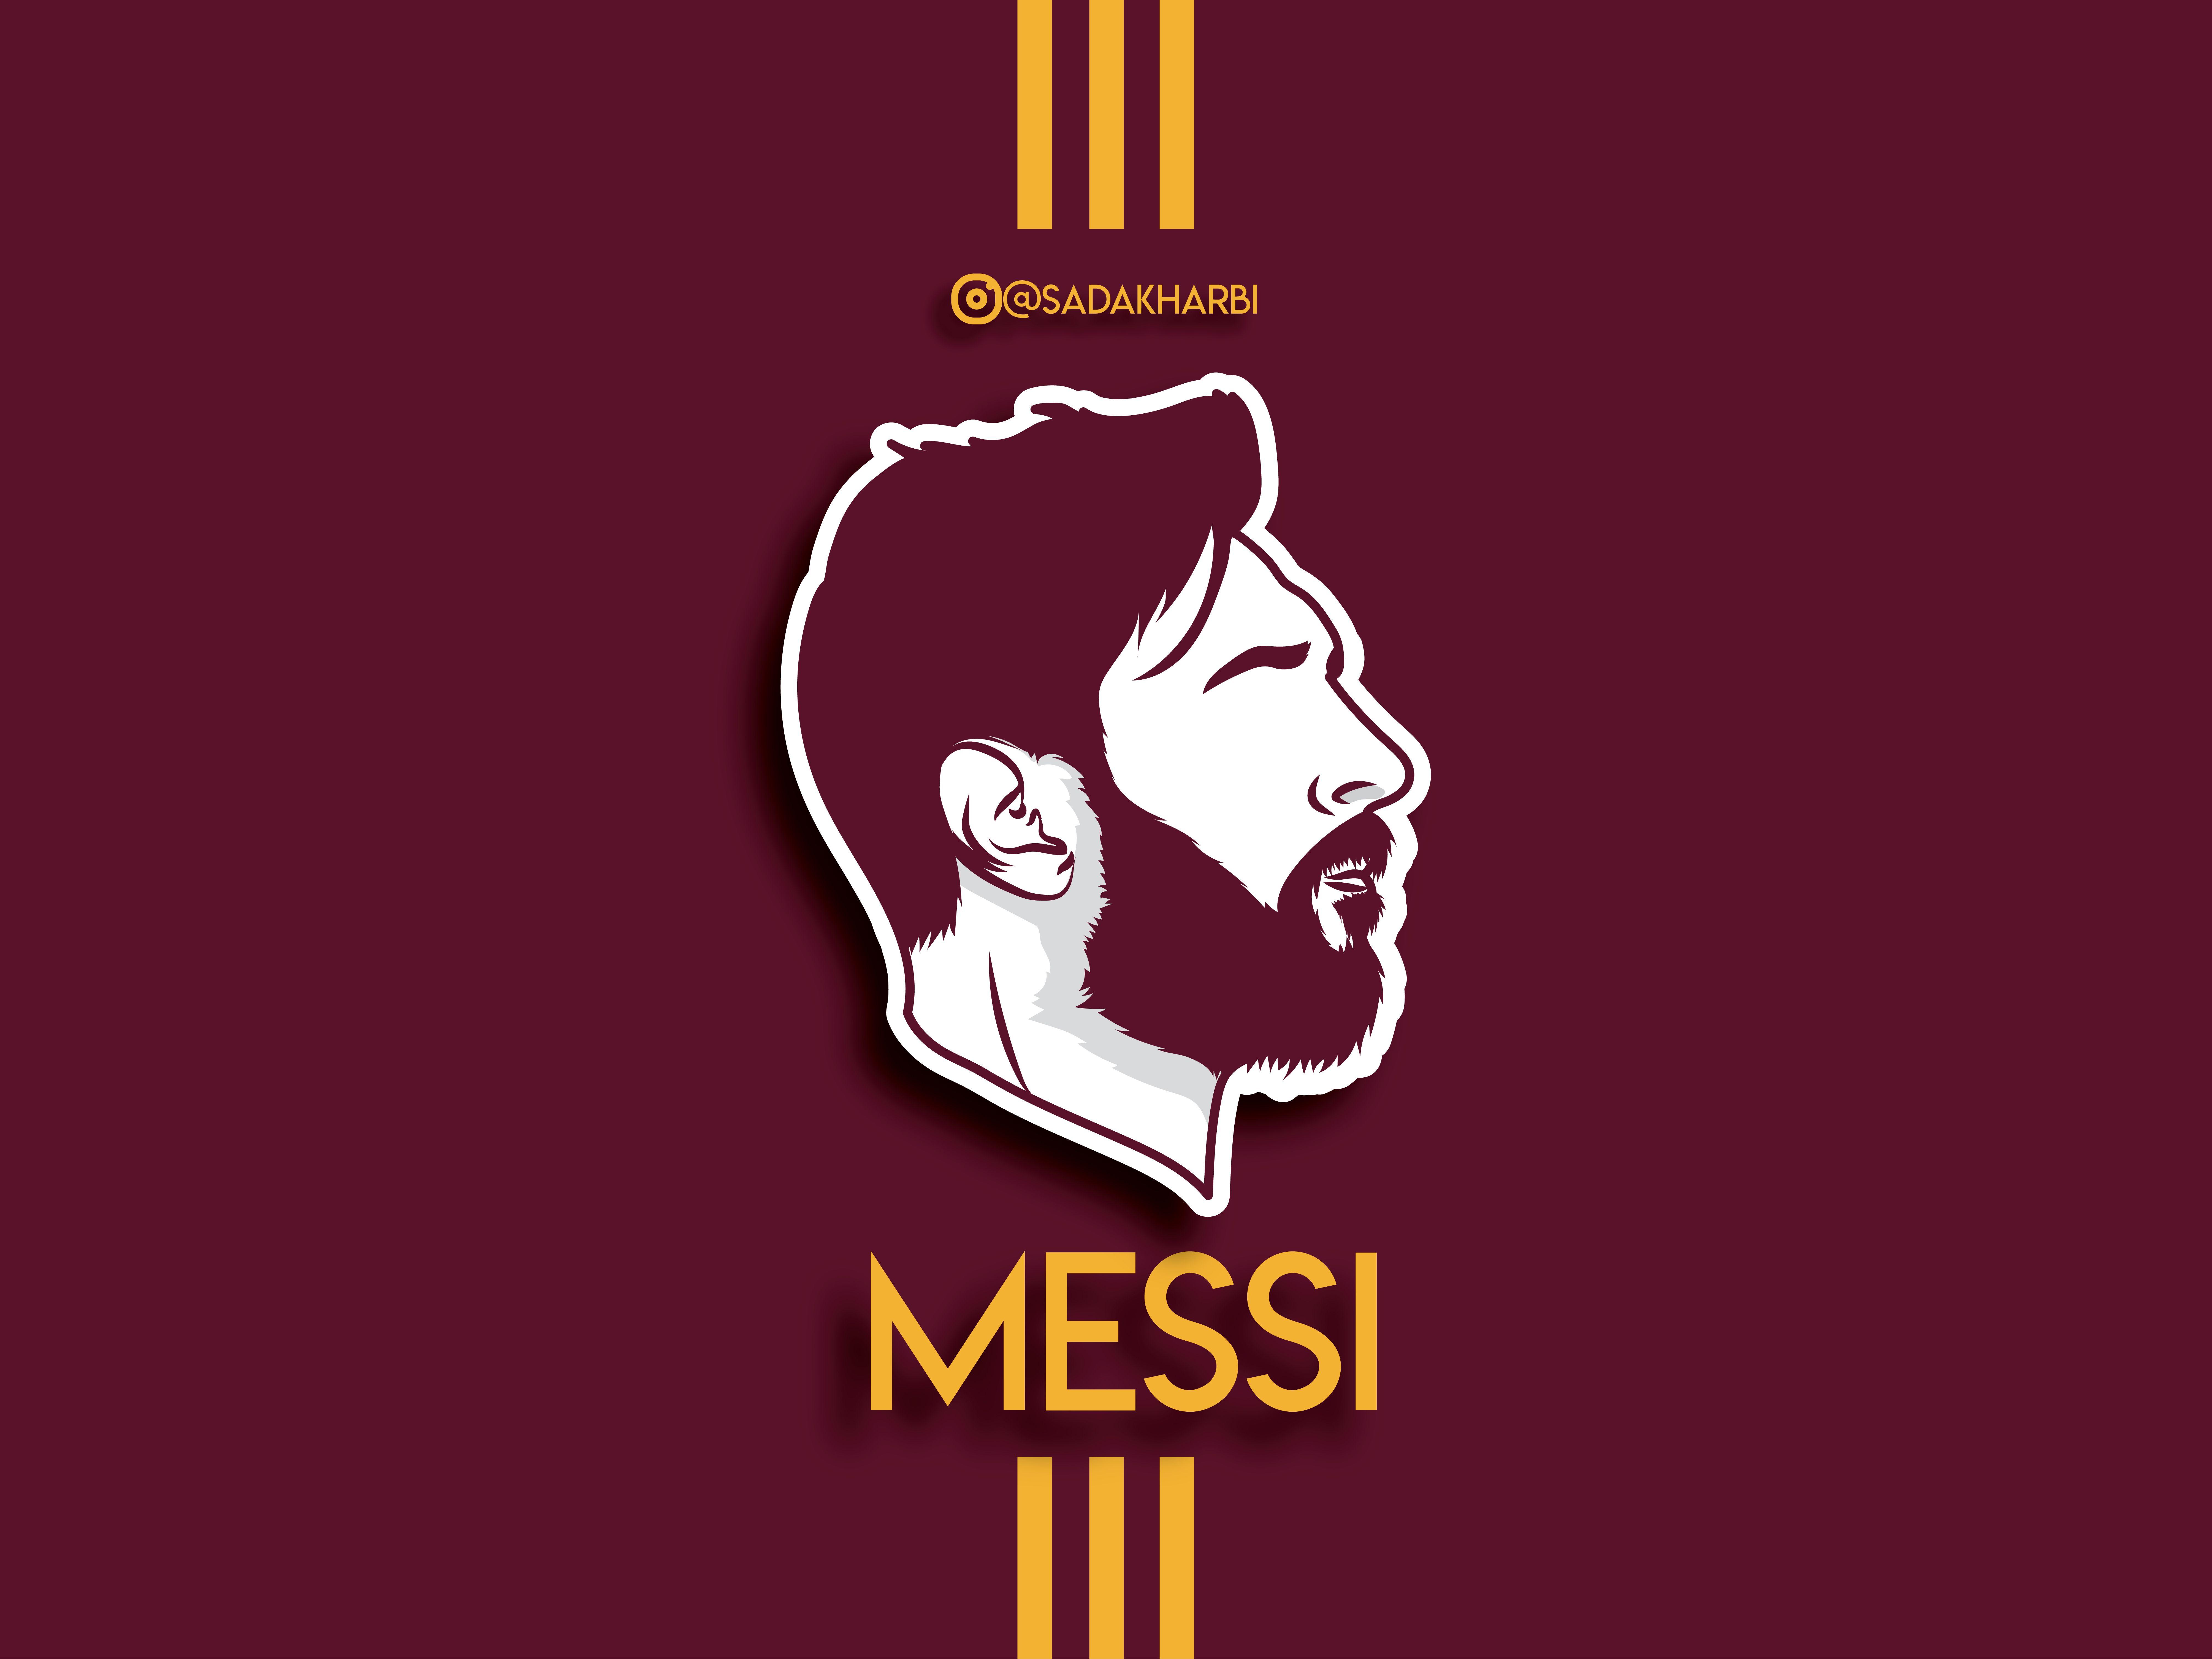 Pin By Editor On Avatar Lionel Messi Leo Messi Leonel Messi 11